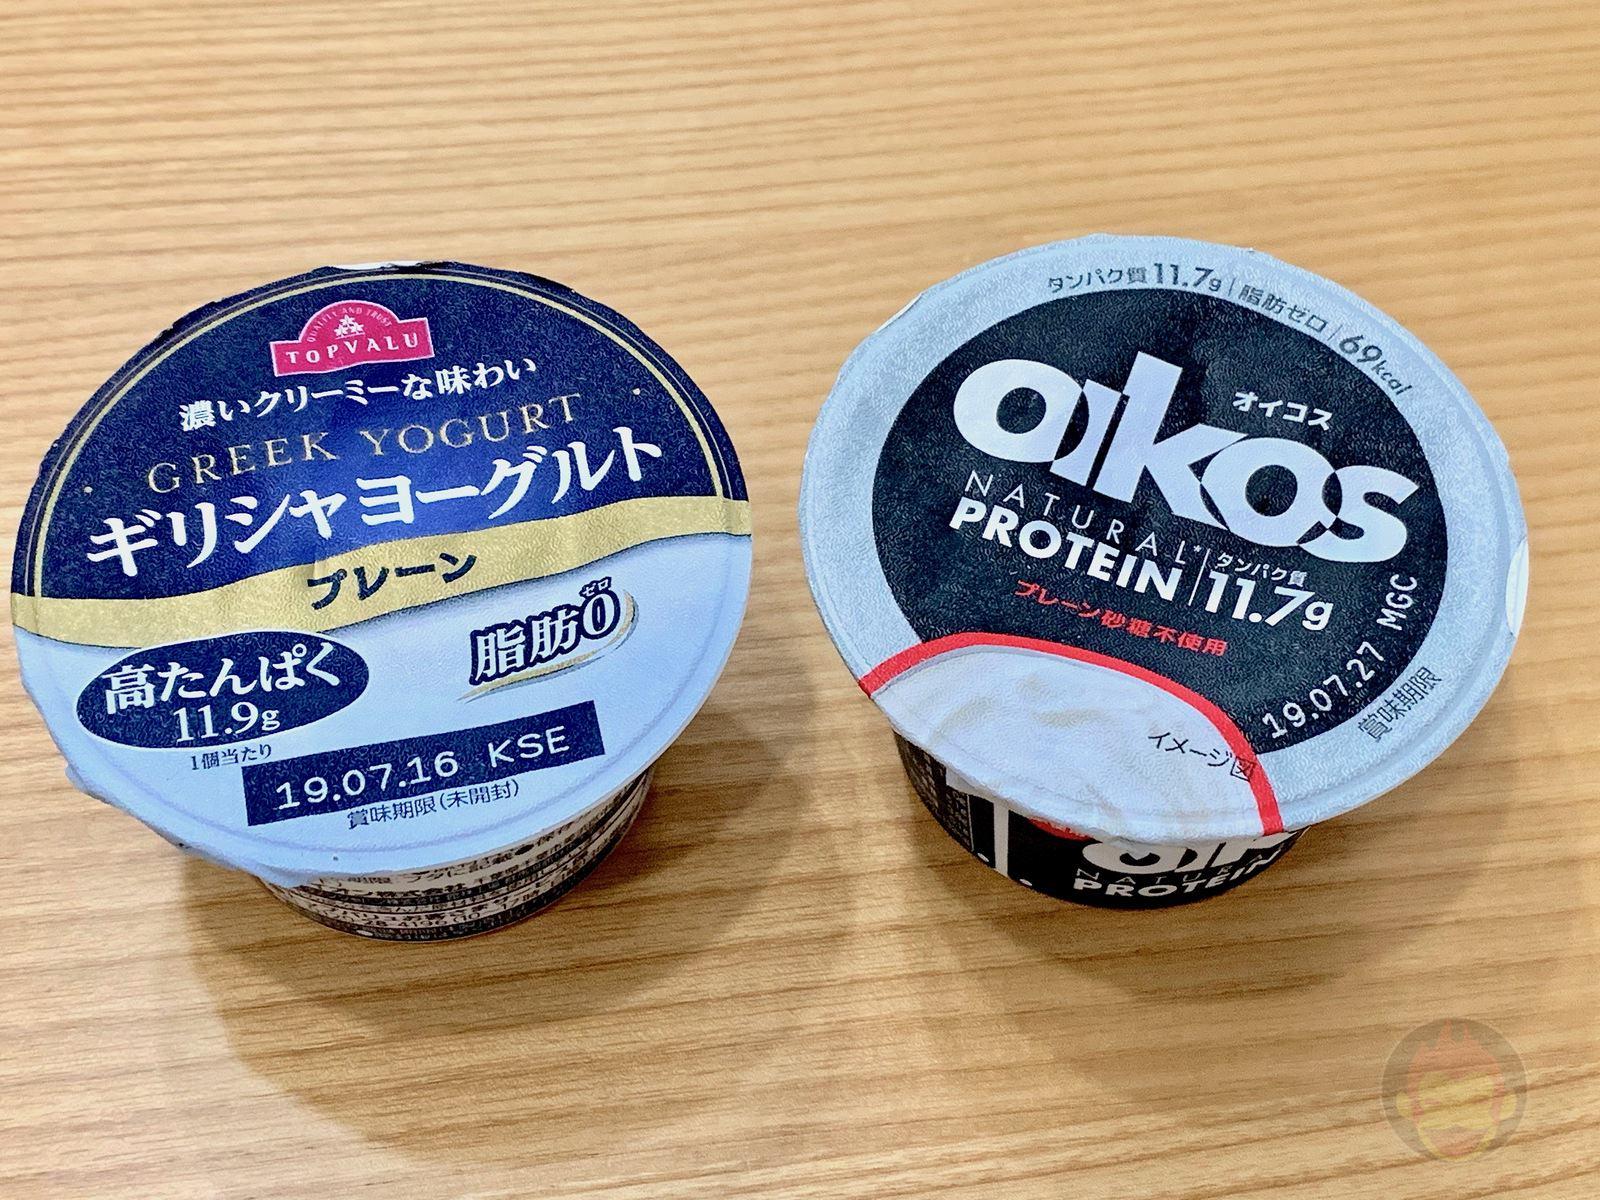 Oikos-TopVALU-Comparison-02.jpg